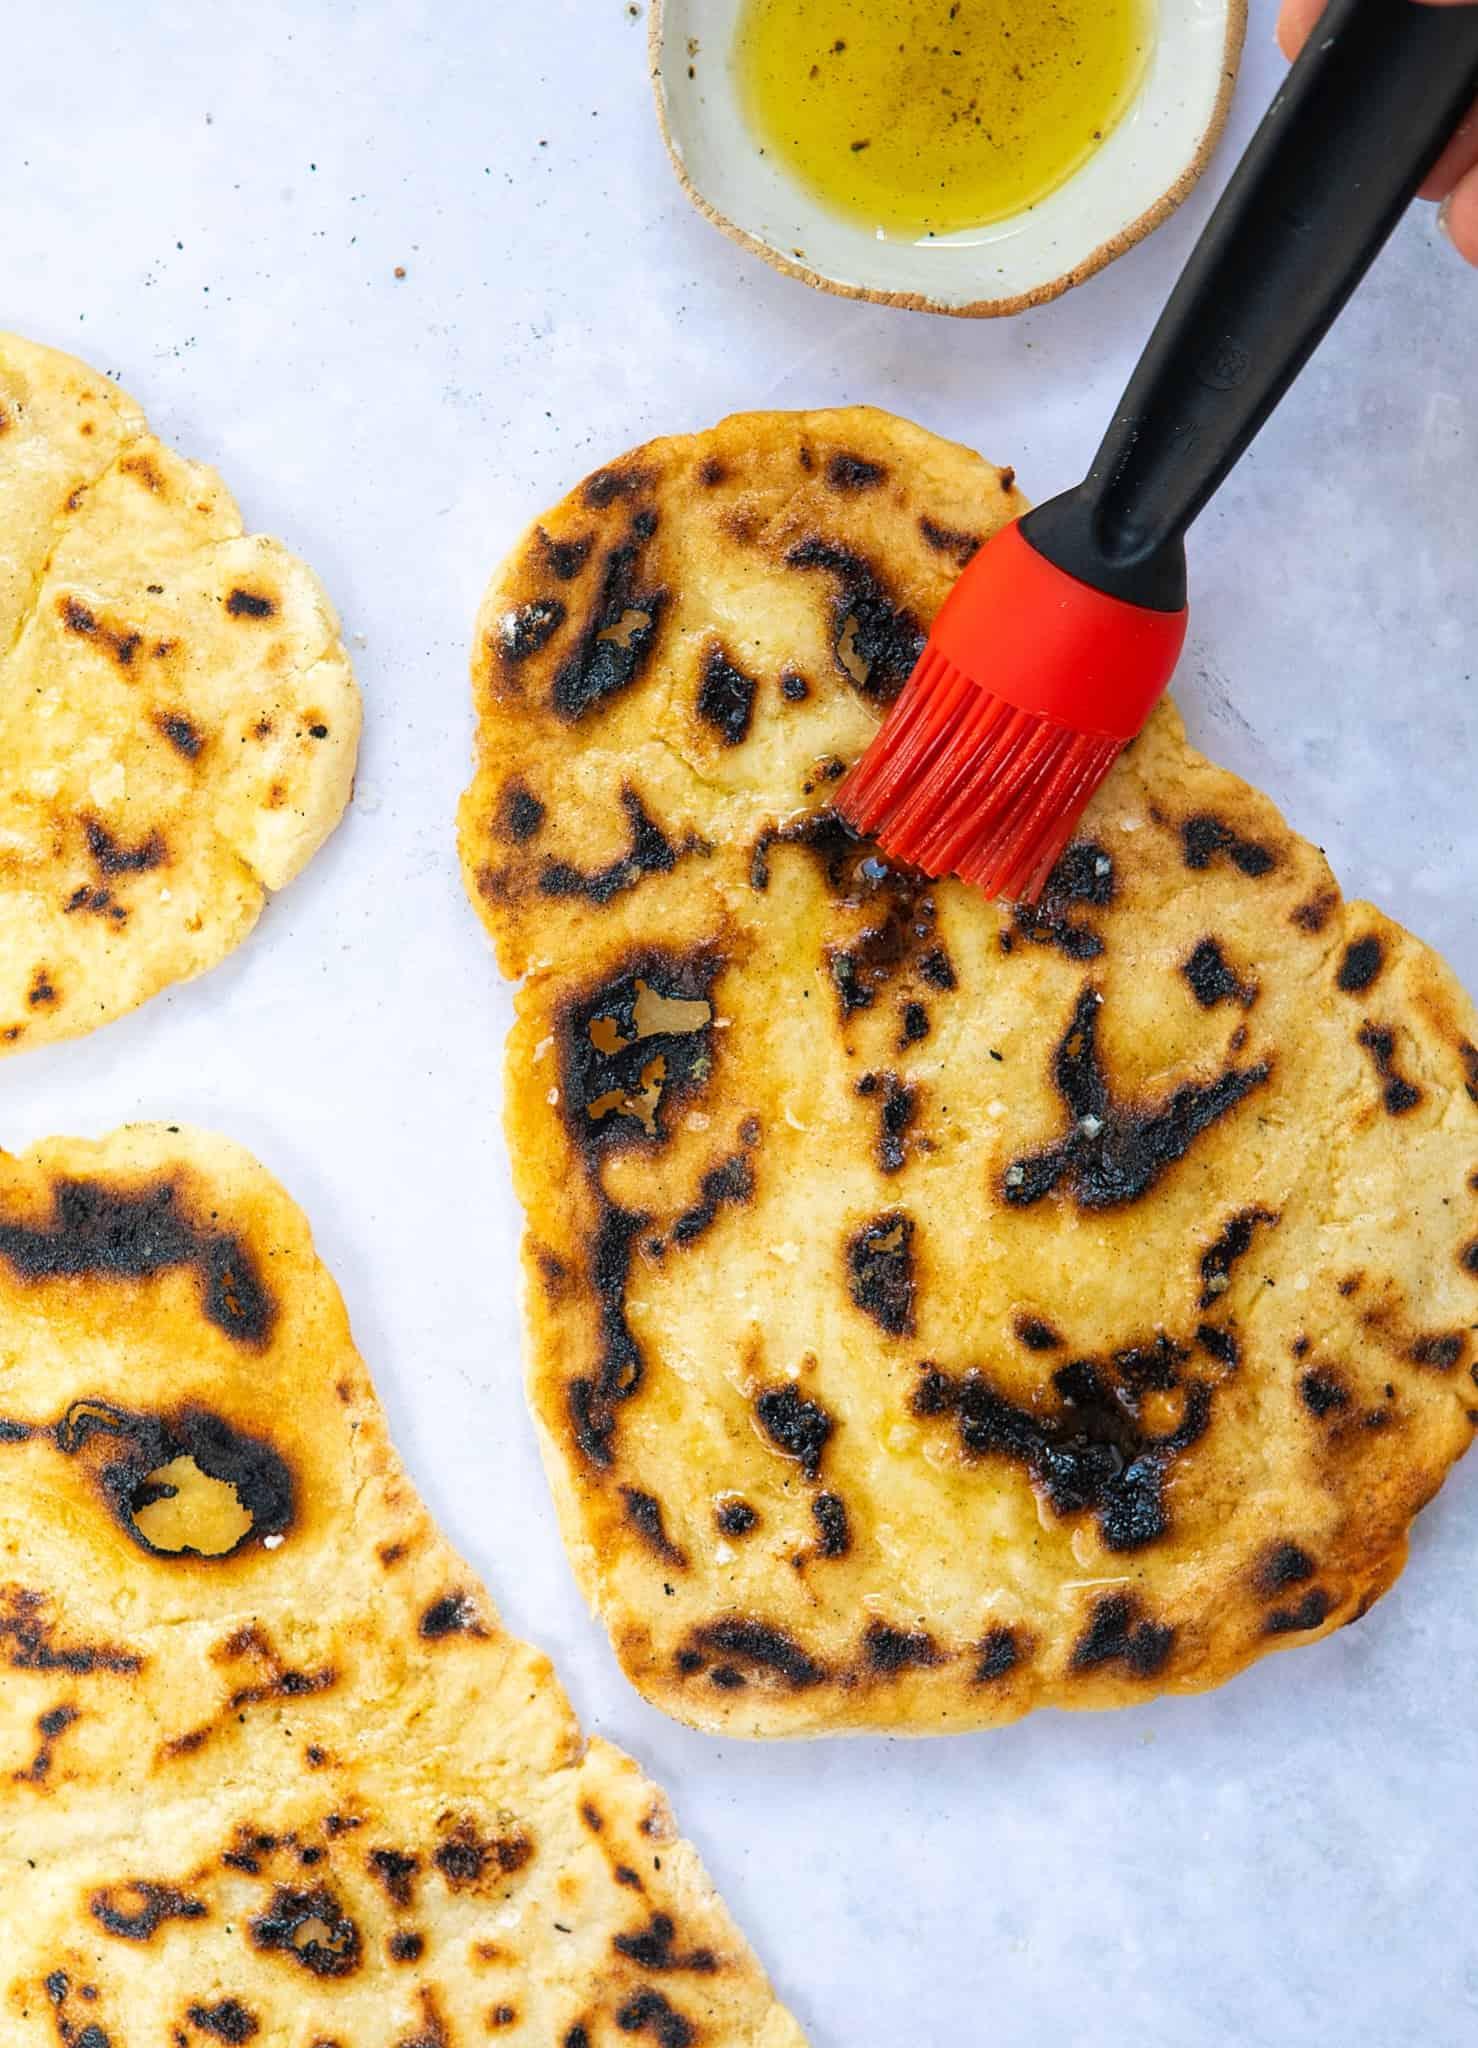 Best Gluten-Free Naan Bread